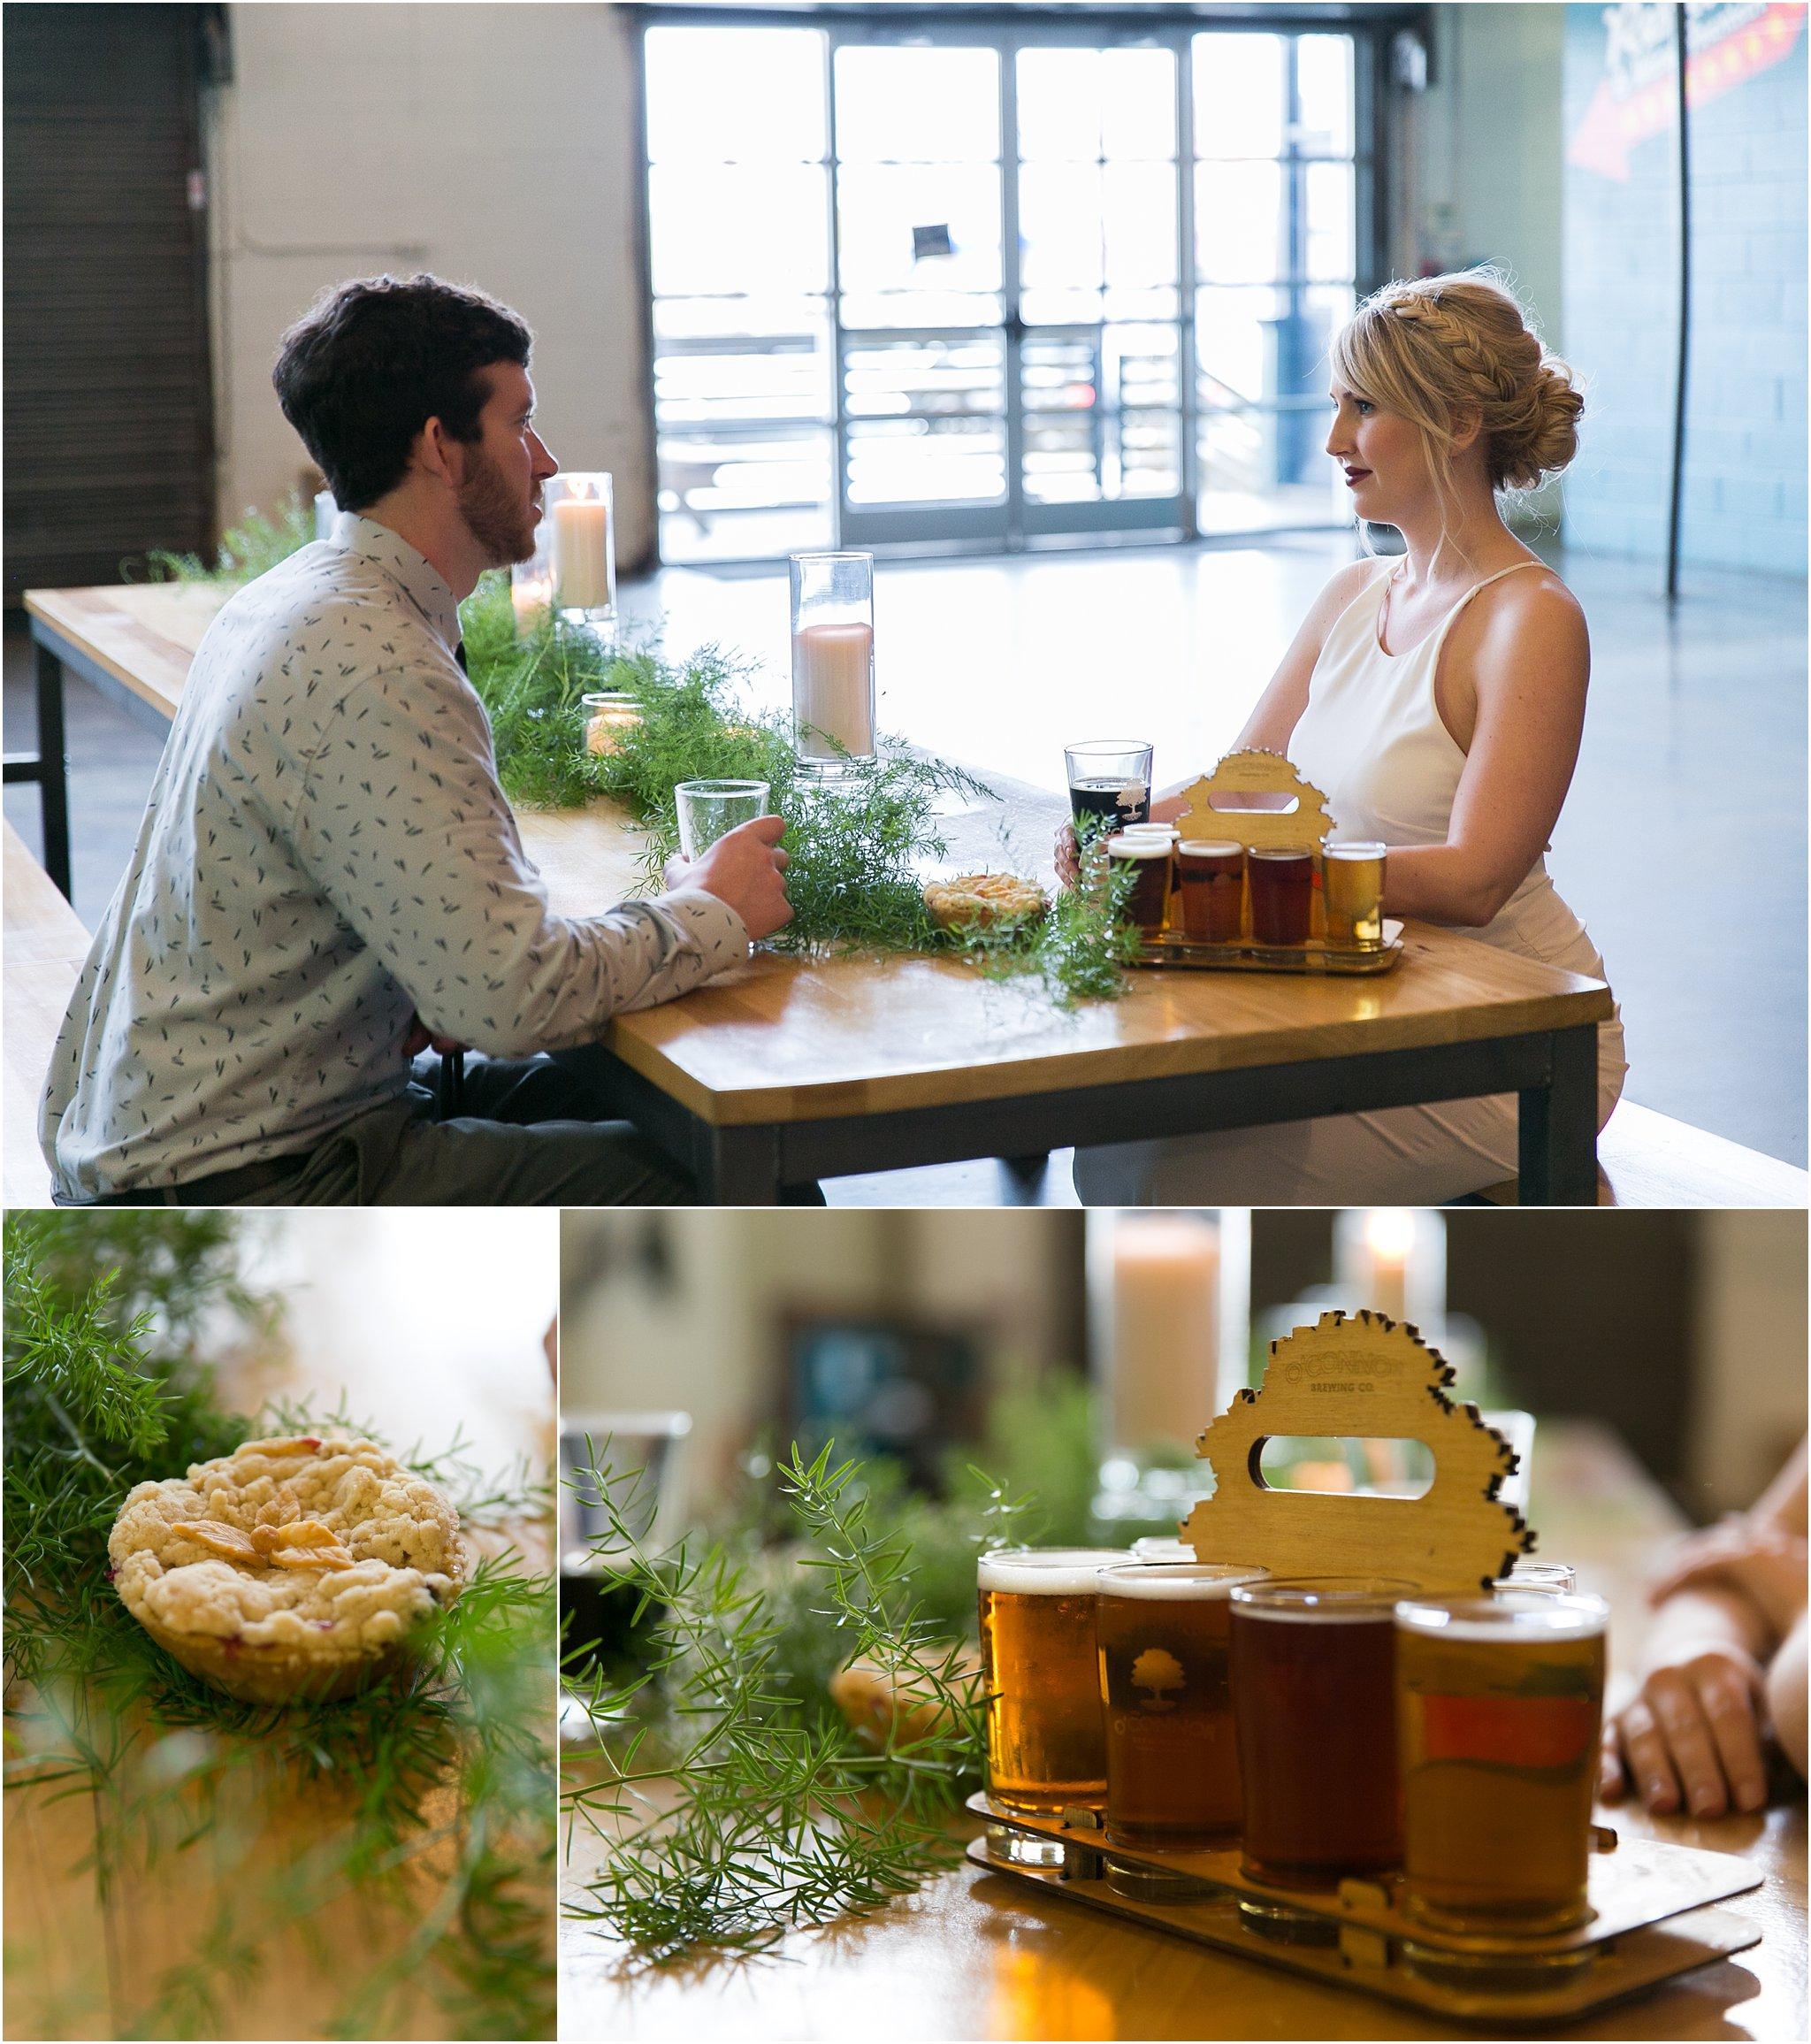 jessica_ryan_photography_oconnor_brewing_wedding_oconnor_brewing_co_norfolk_virginia_roost_flowers_blue_birds_garage__0822